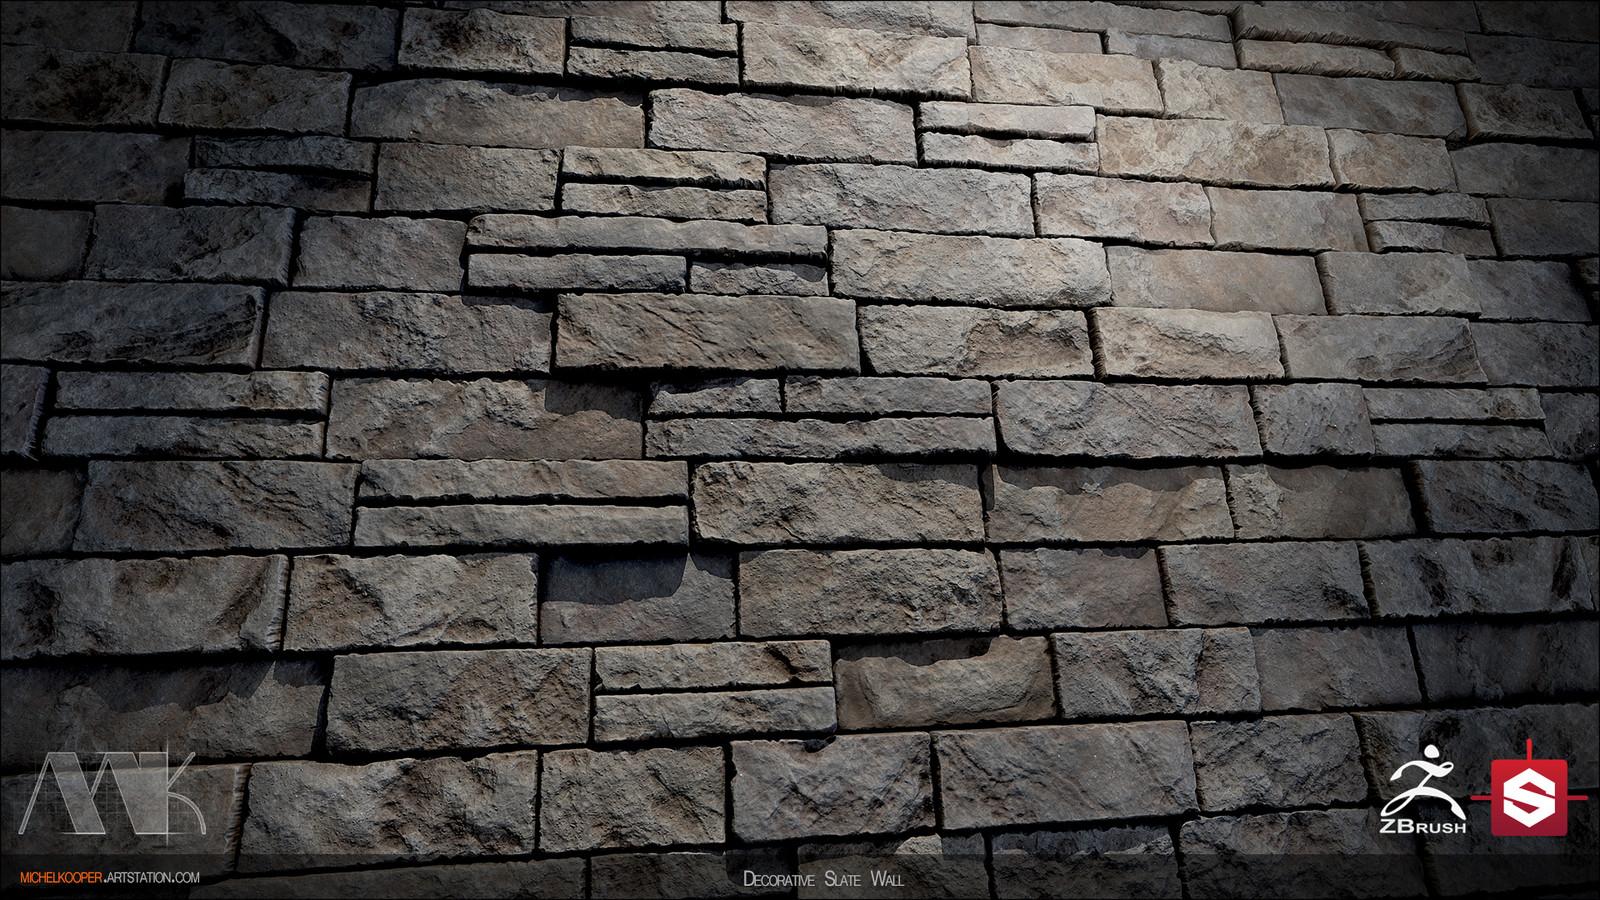 Decorative Slate Wall - Close up